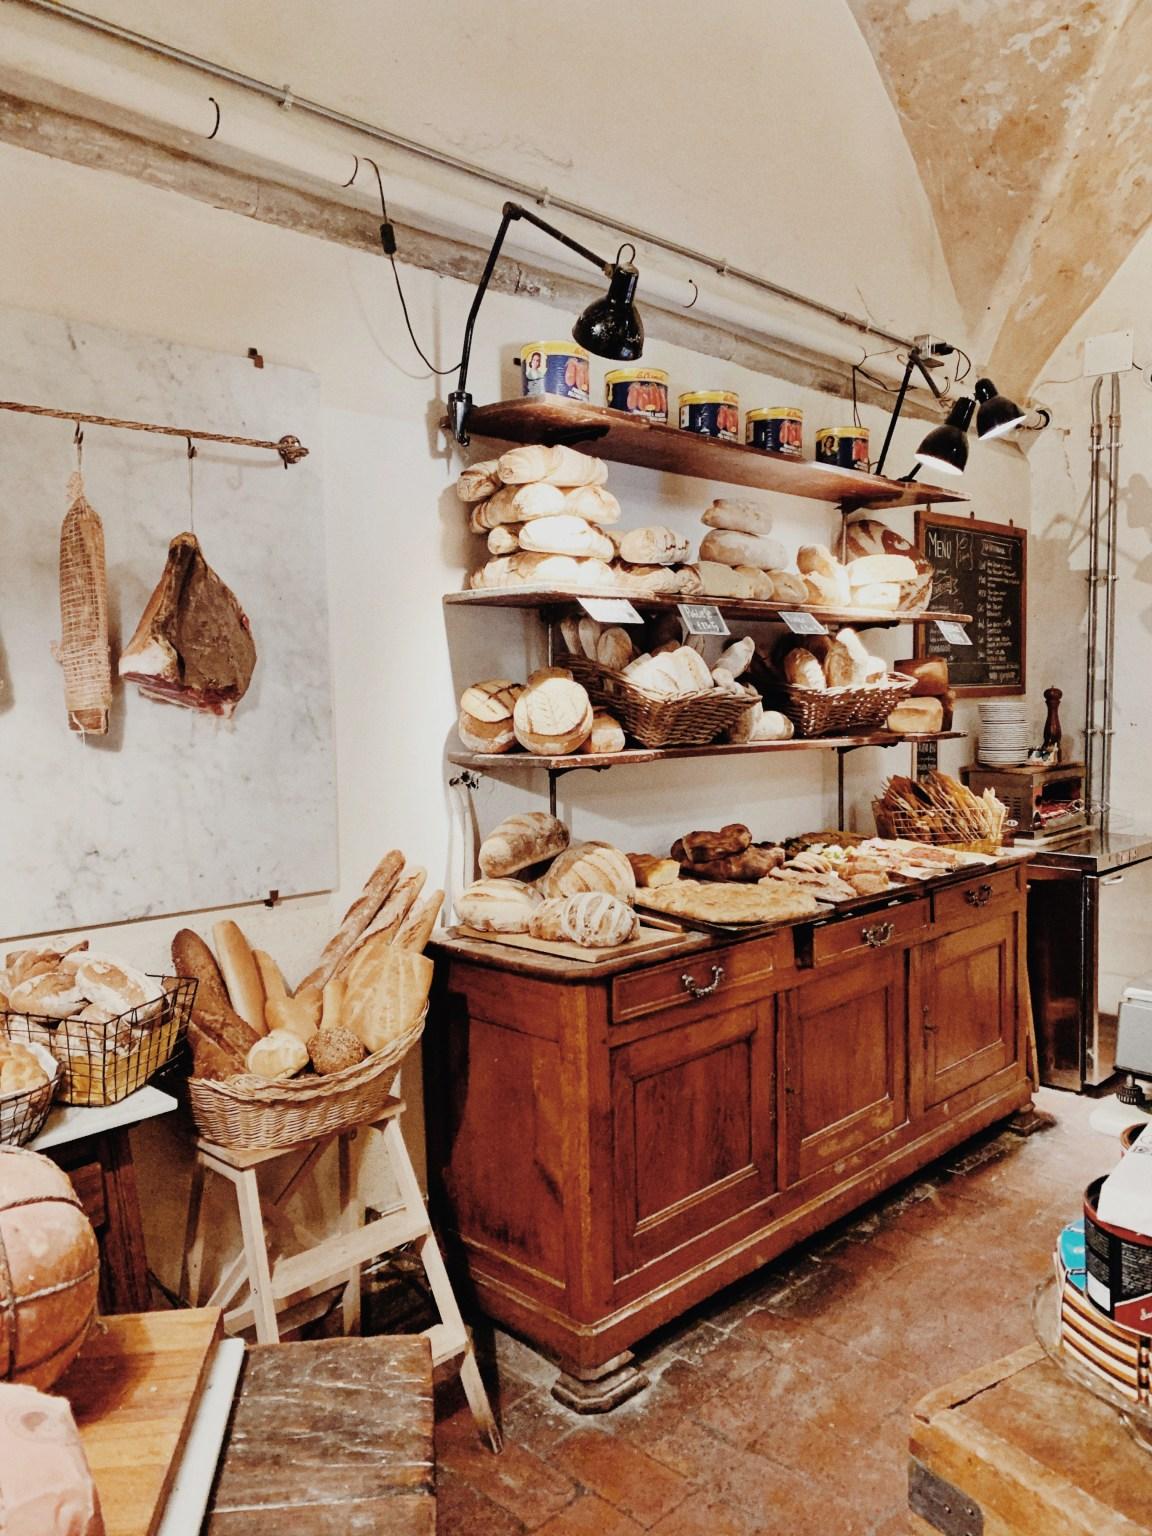 På det mysigaste bageriet i Florens, Il Panificio